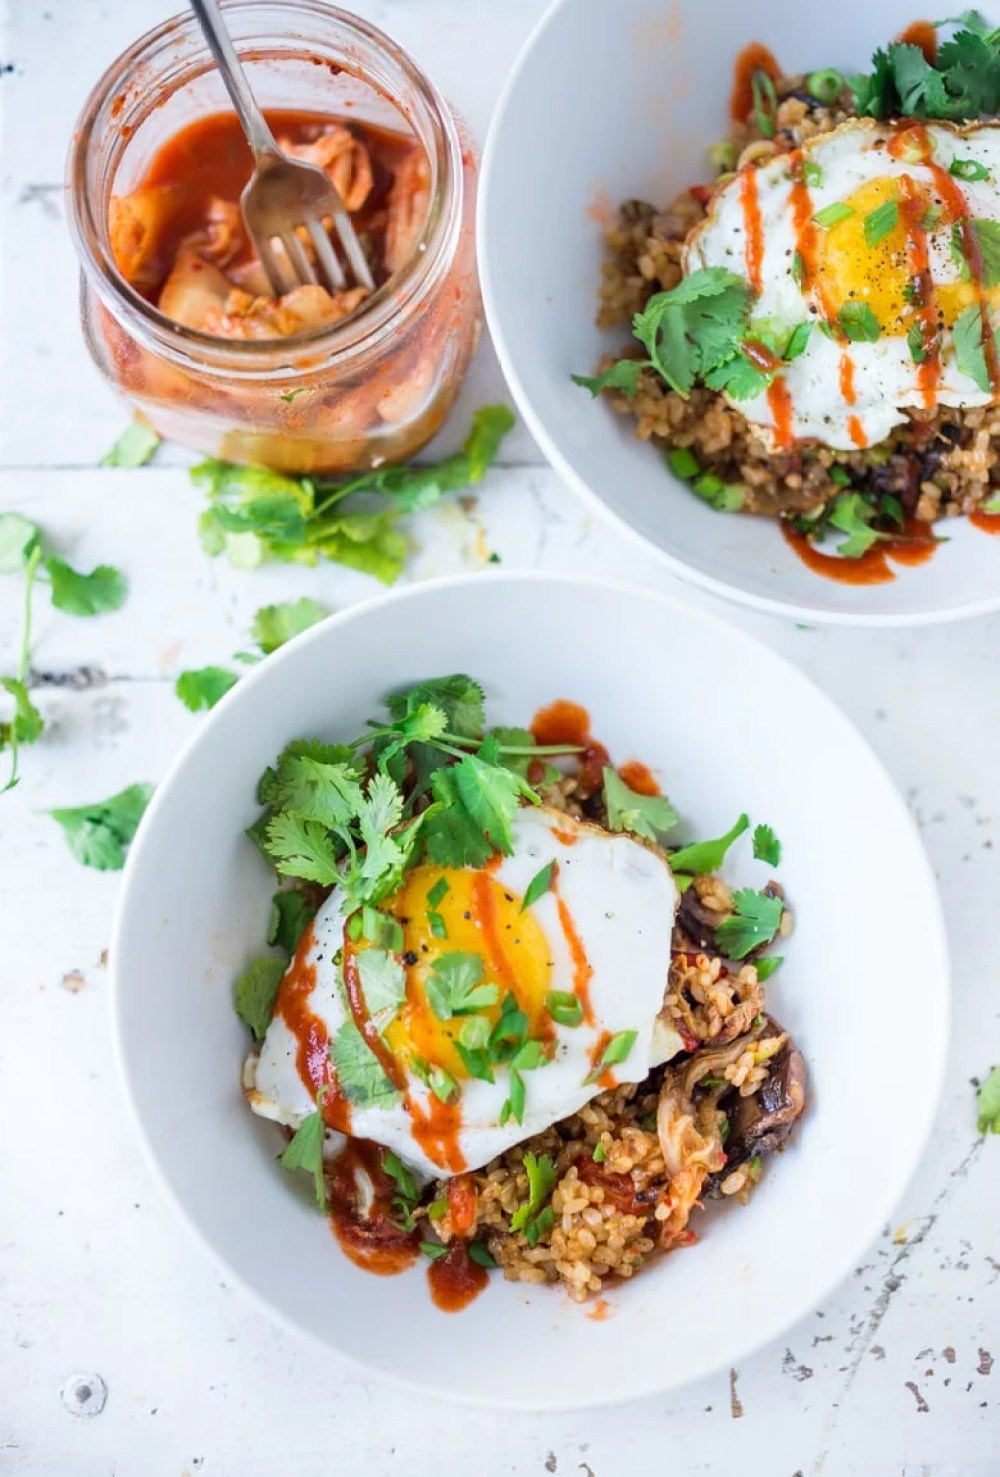 Kimchi Rice- a healthier take using brown rice , seasonal veggies and less oil! | www.feastingathome.com